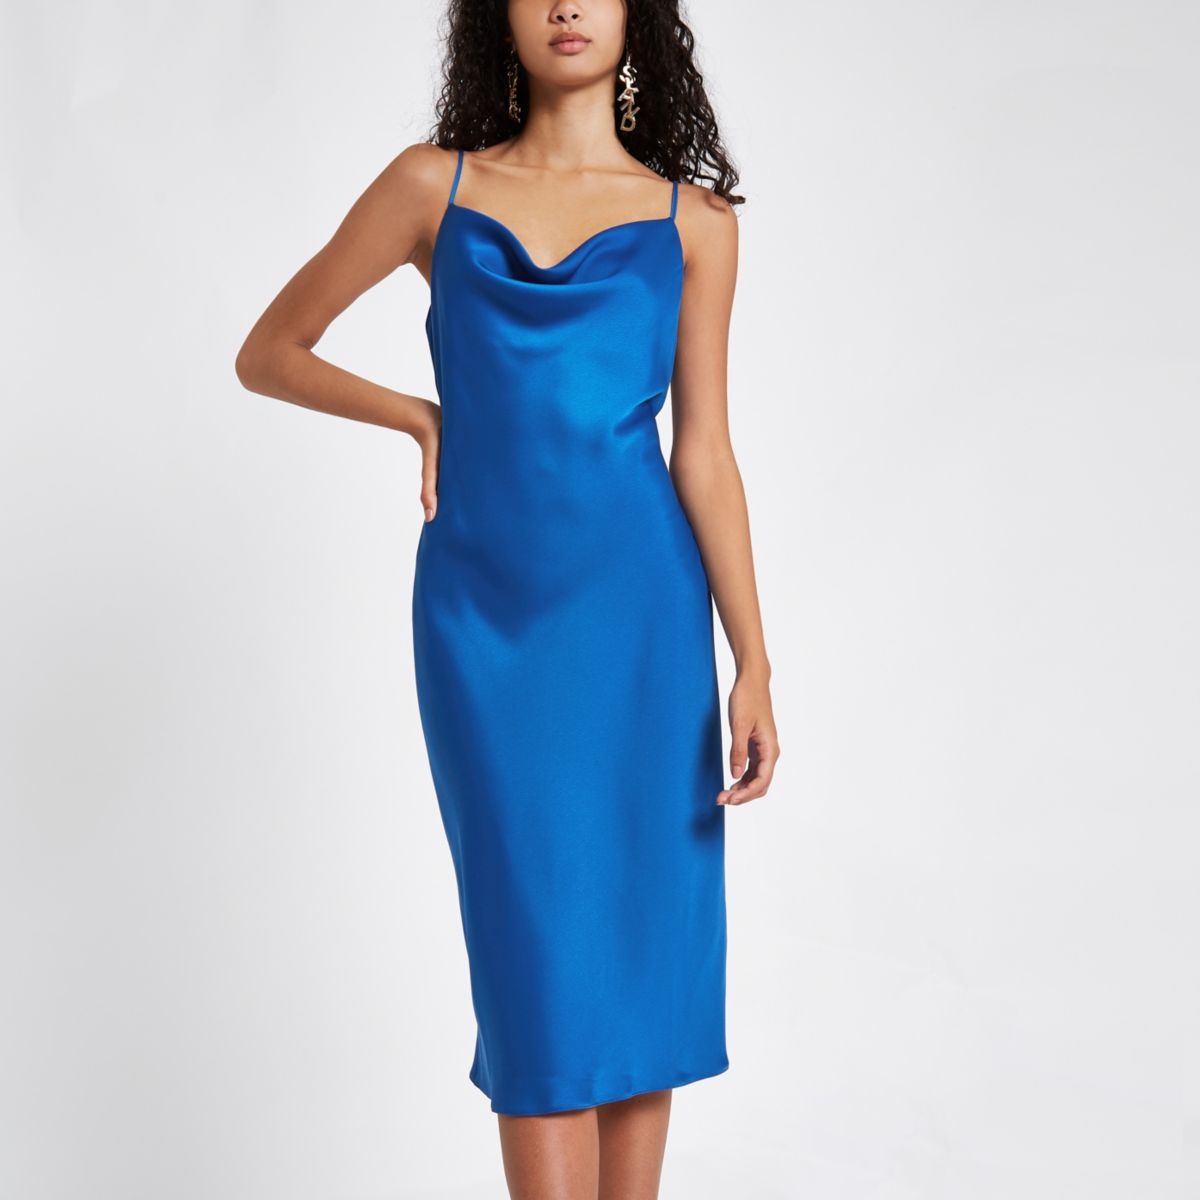 Blue satin cowl neck slip dress